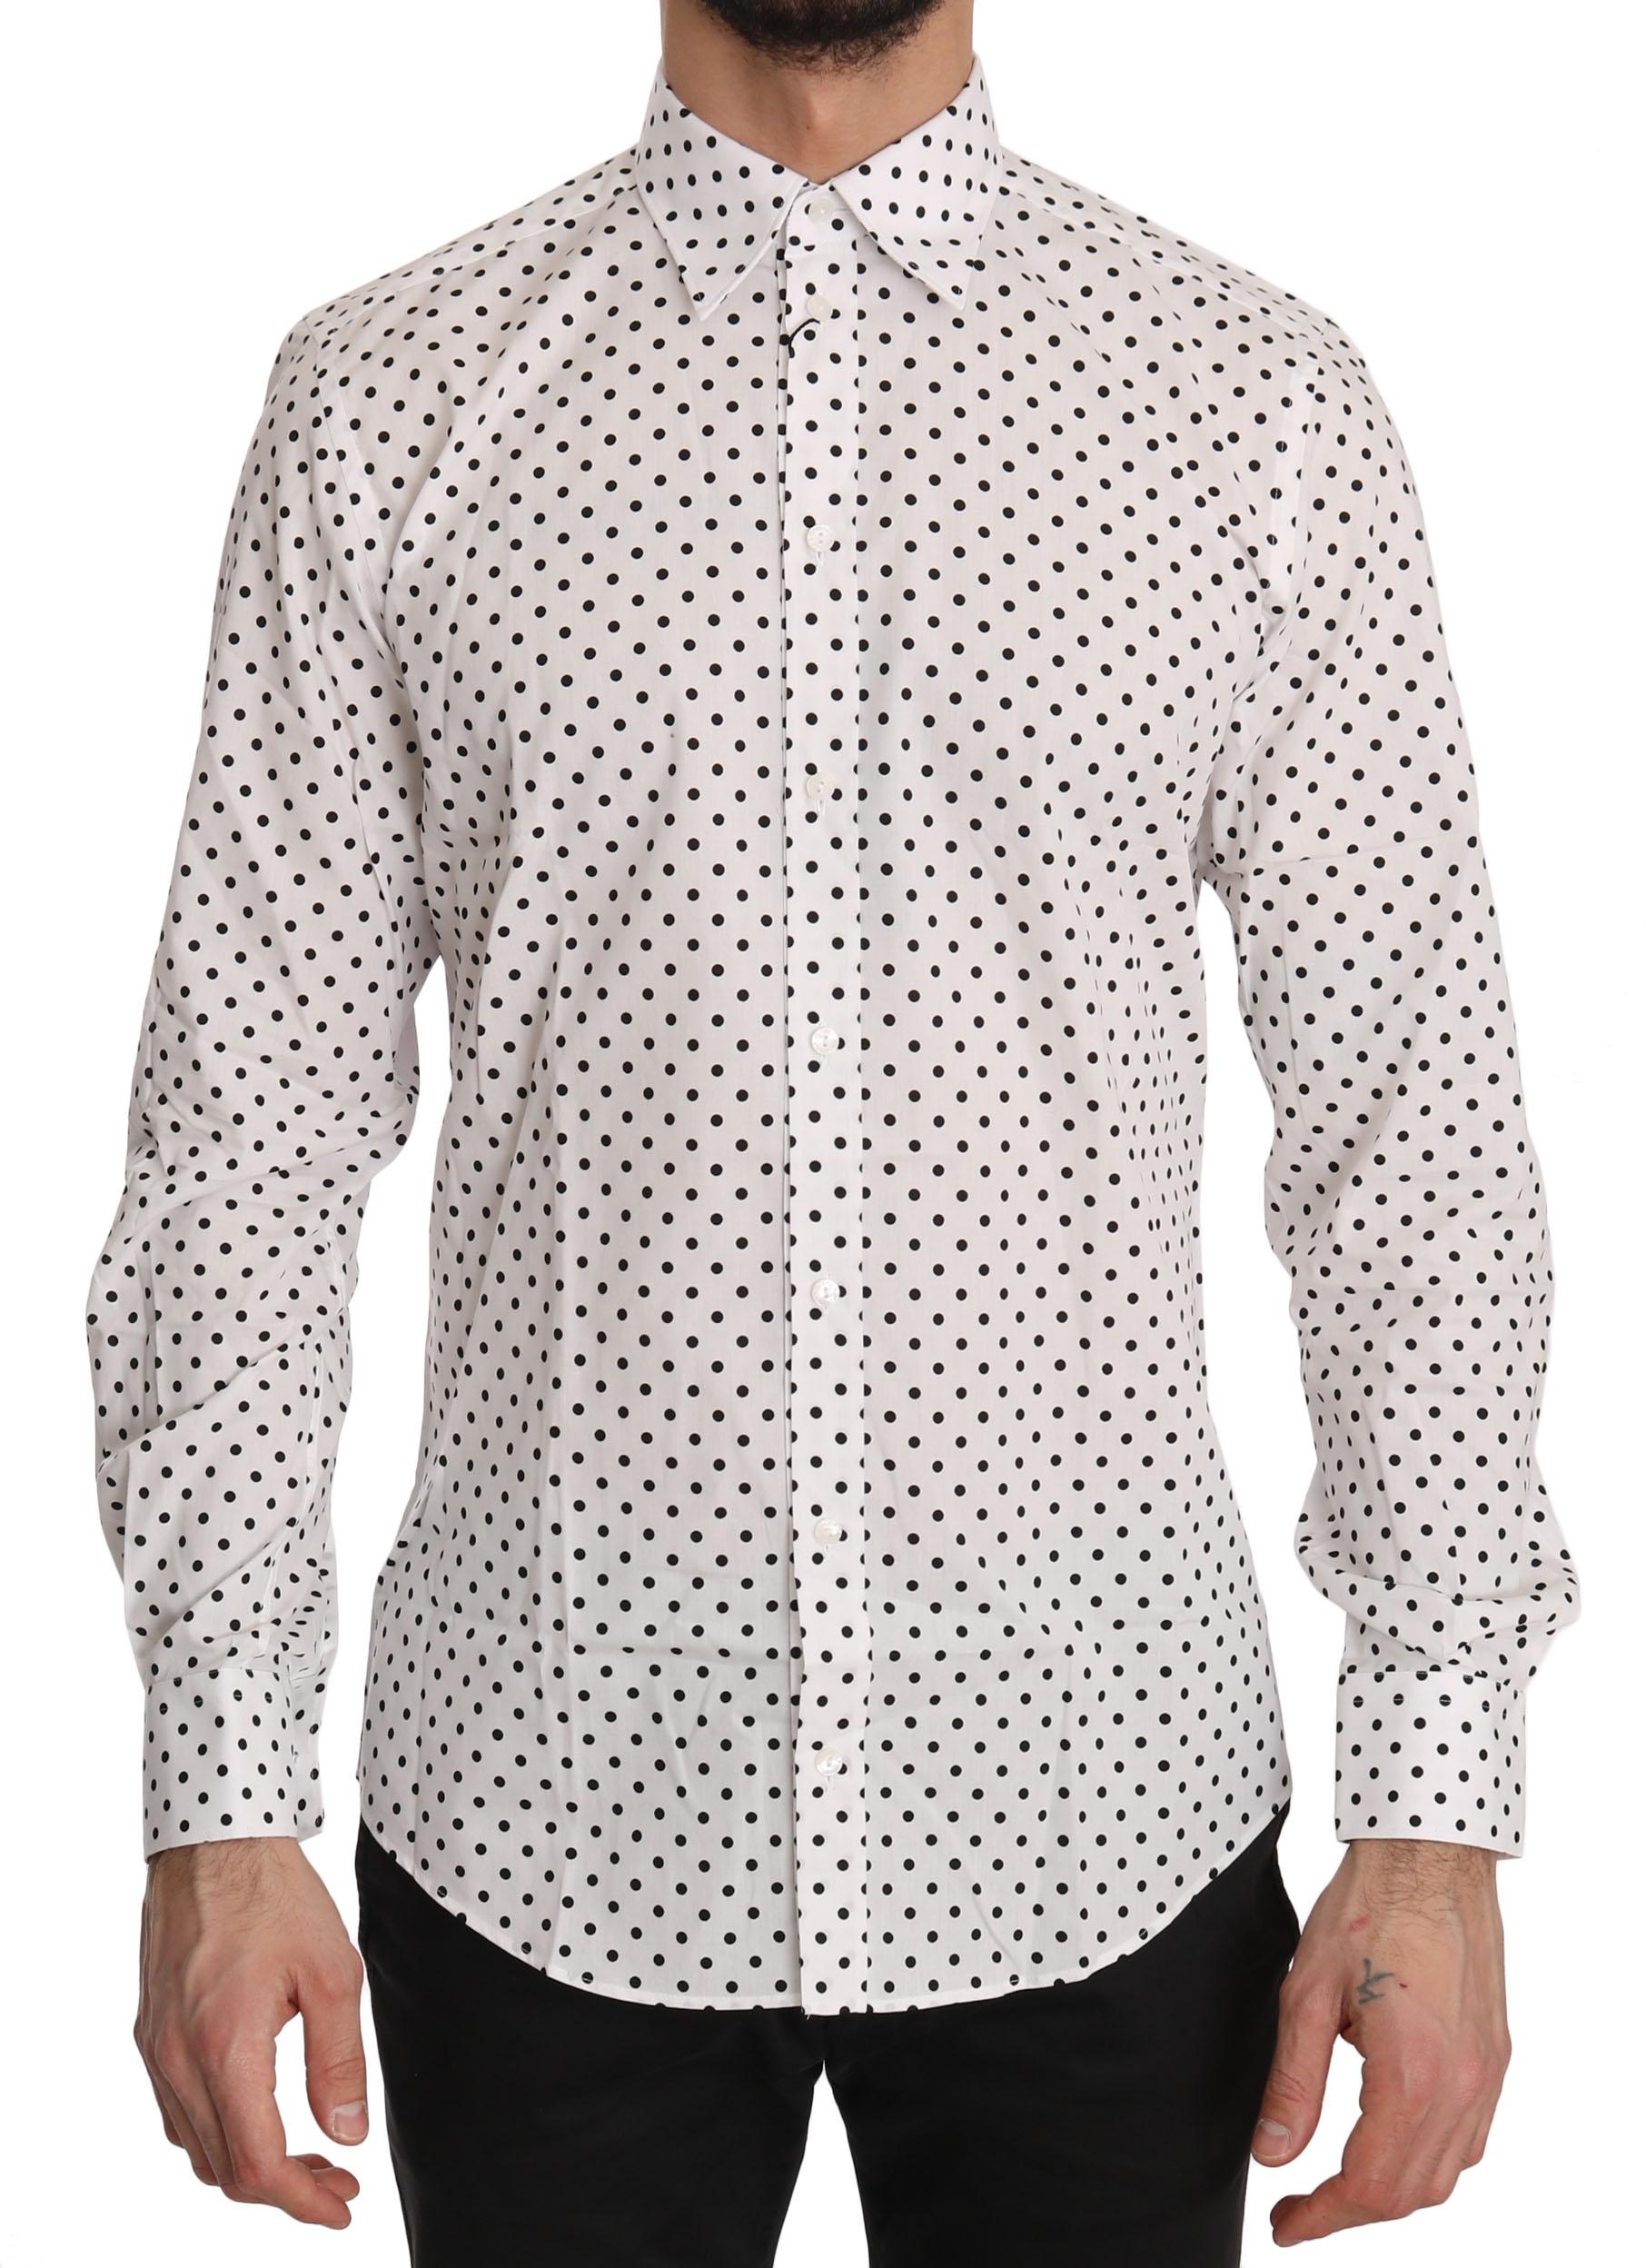 Dolce & Gabbana Men's Shirt Multicolor TSH3630 - IT37 | XS